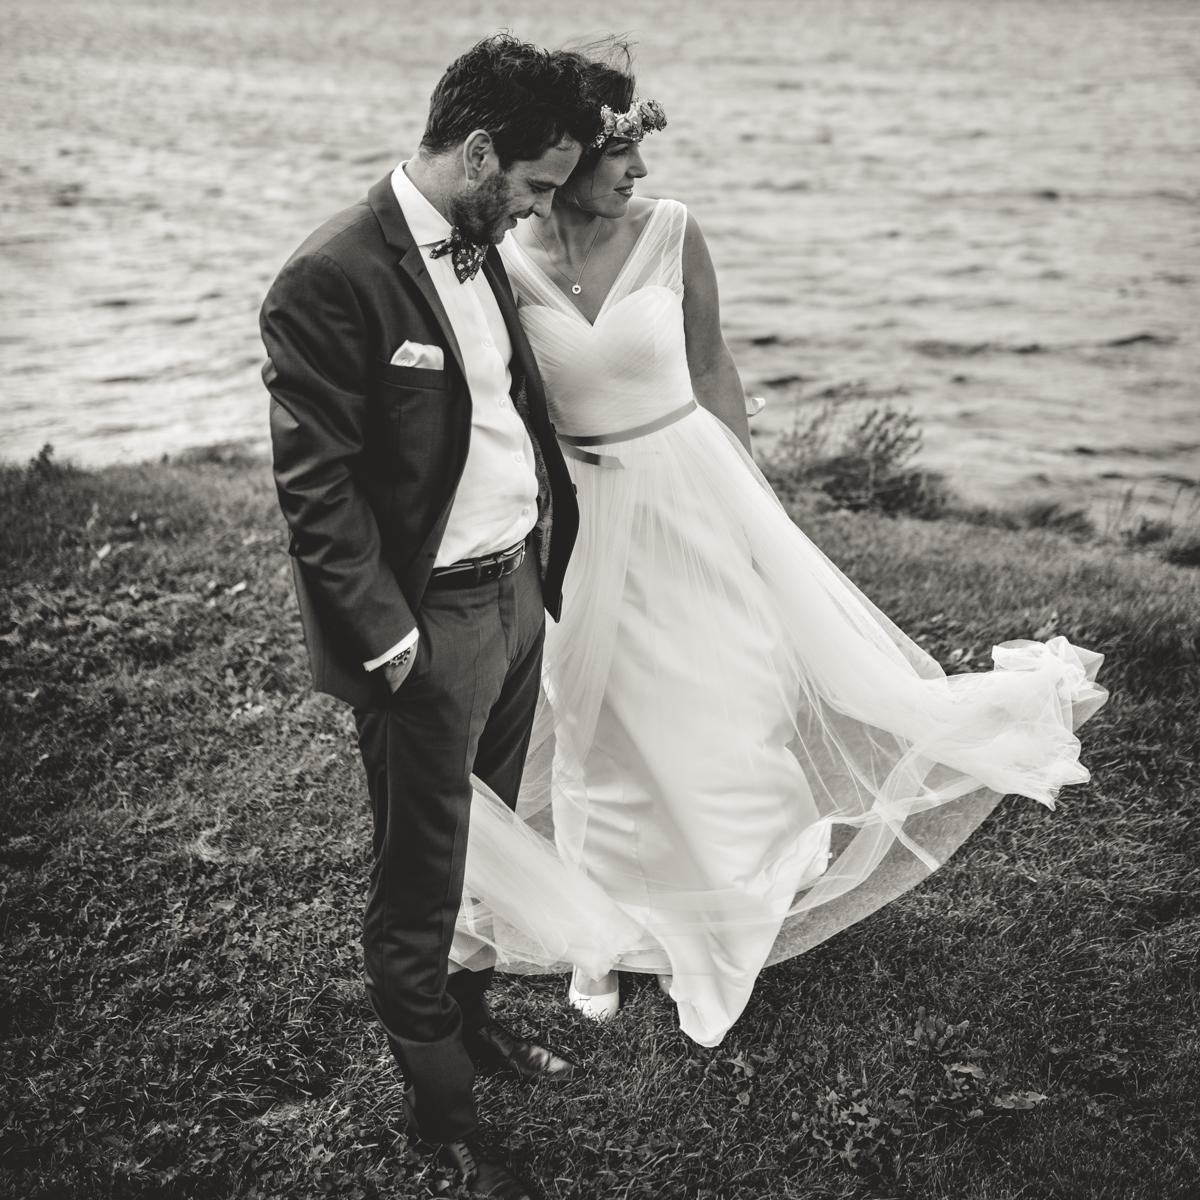 Hochzeit-Gut-Lebbin-Ruegen-filitz-fotografie-paar-sw